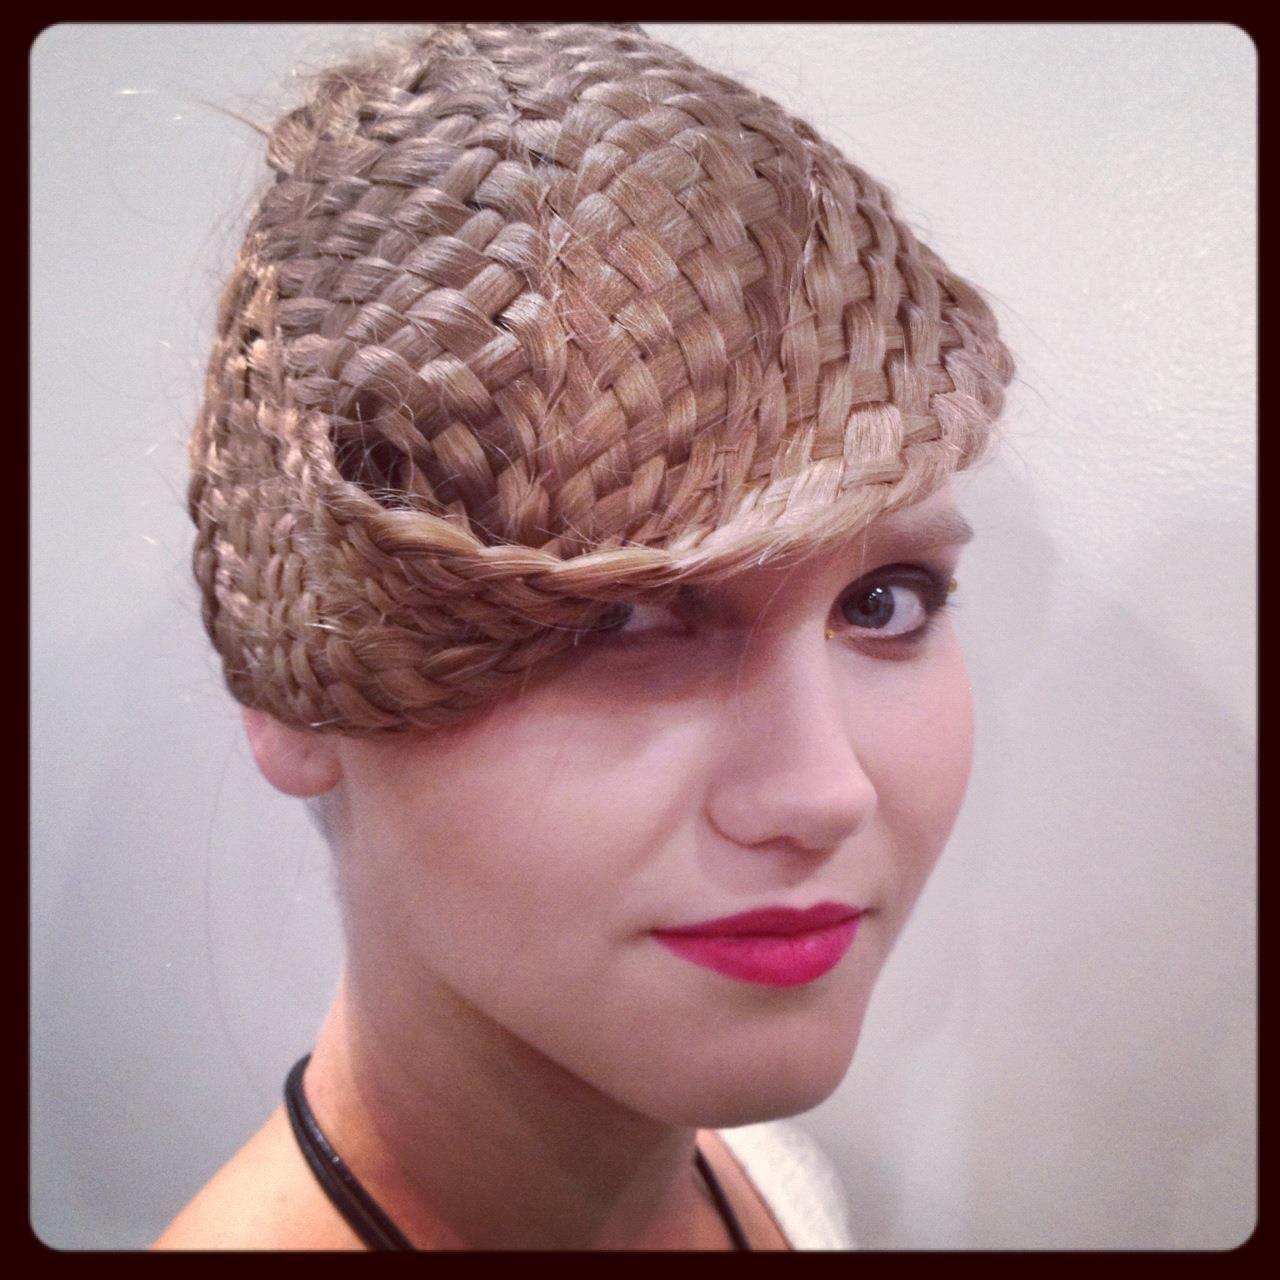 Braiding can be unique amazing hair basket weave braid and braiding can be unique pmusecretfo Images